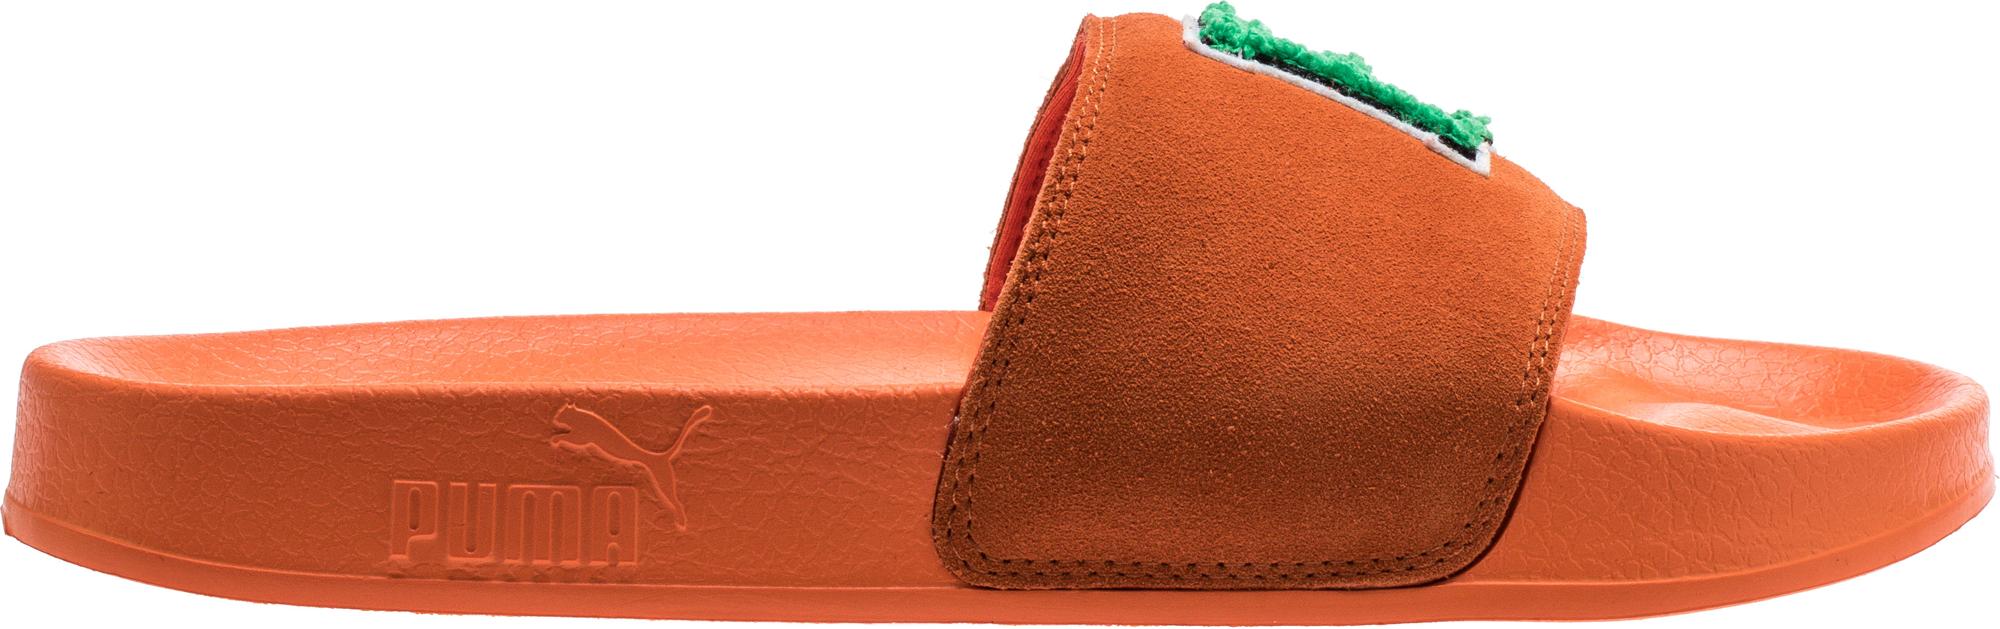 Puma Leadcat Slide Rihanna Fenty FU Orange (W)